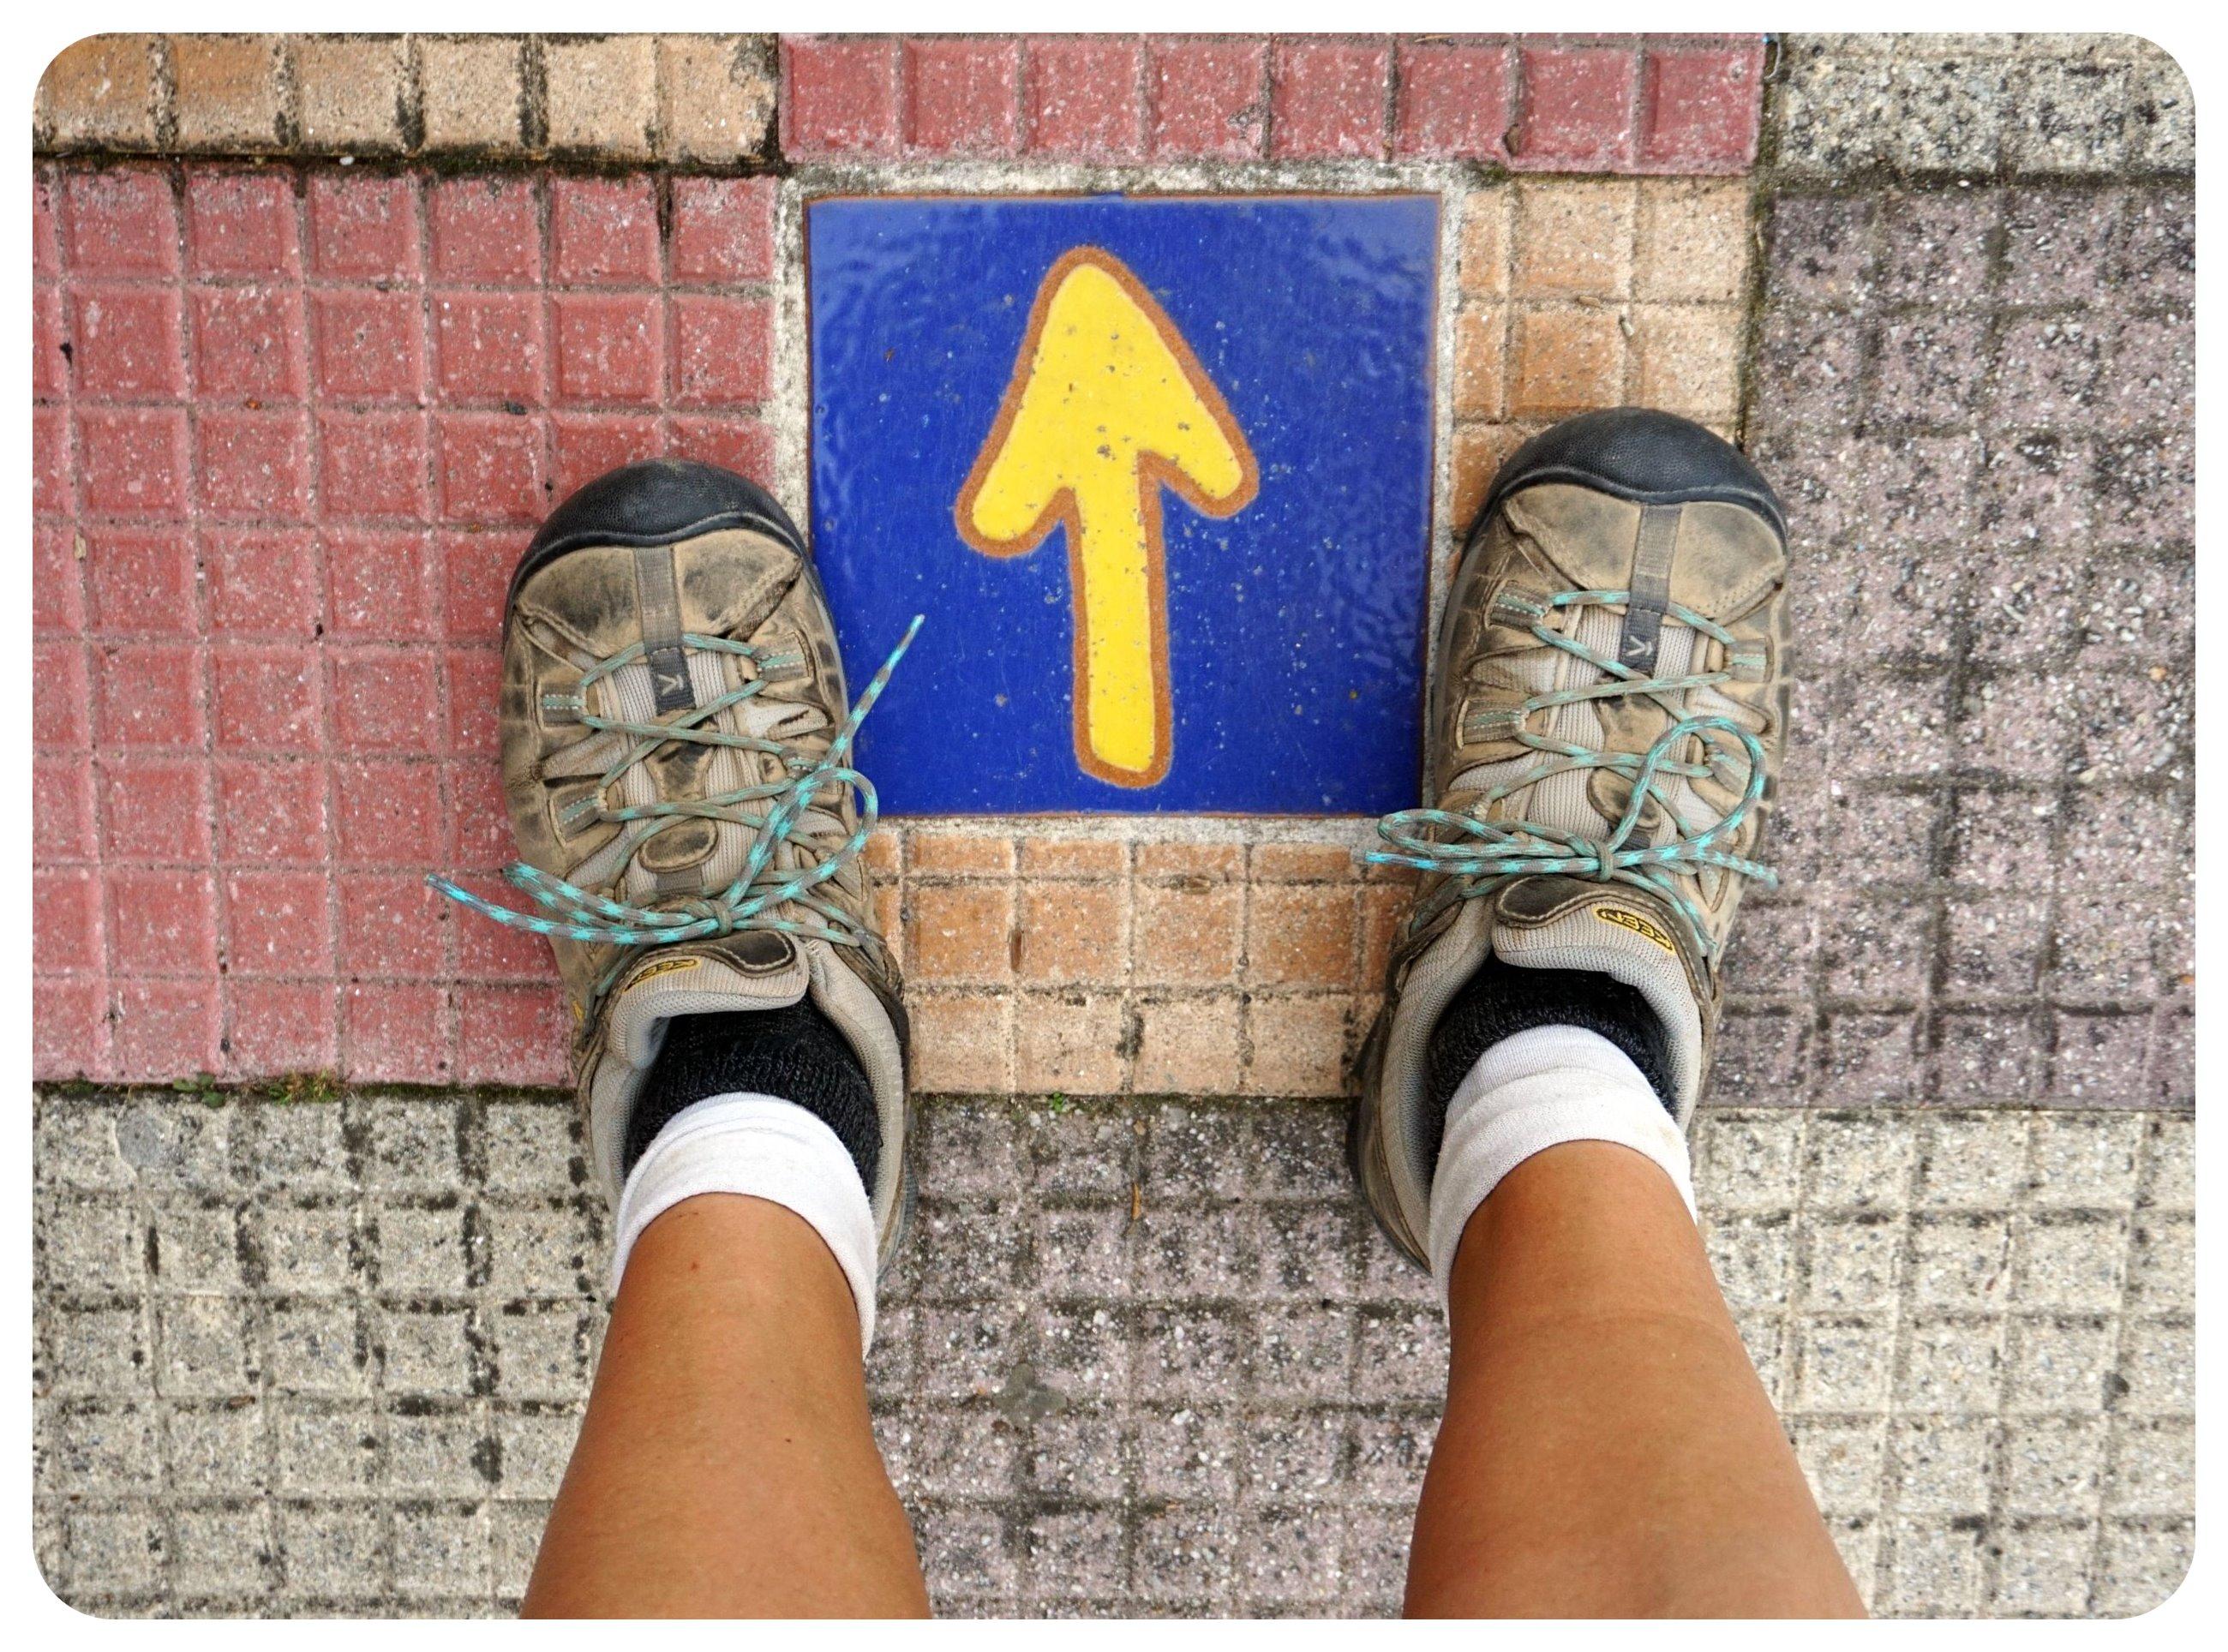 camino de santiago yellow arrow